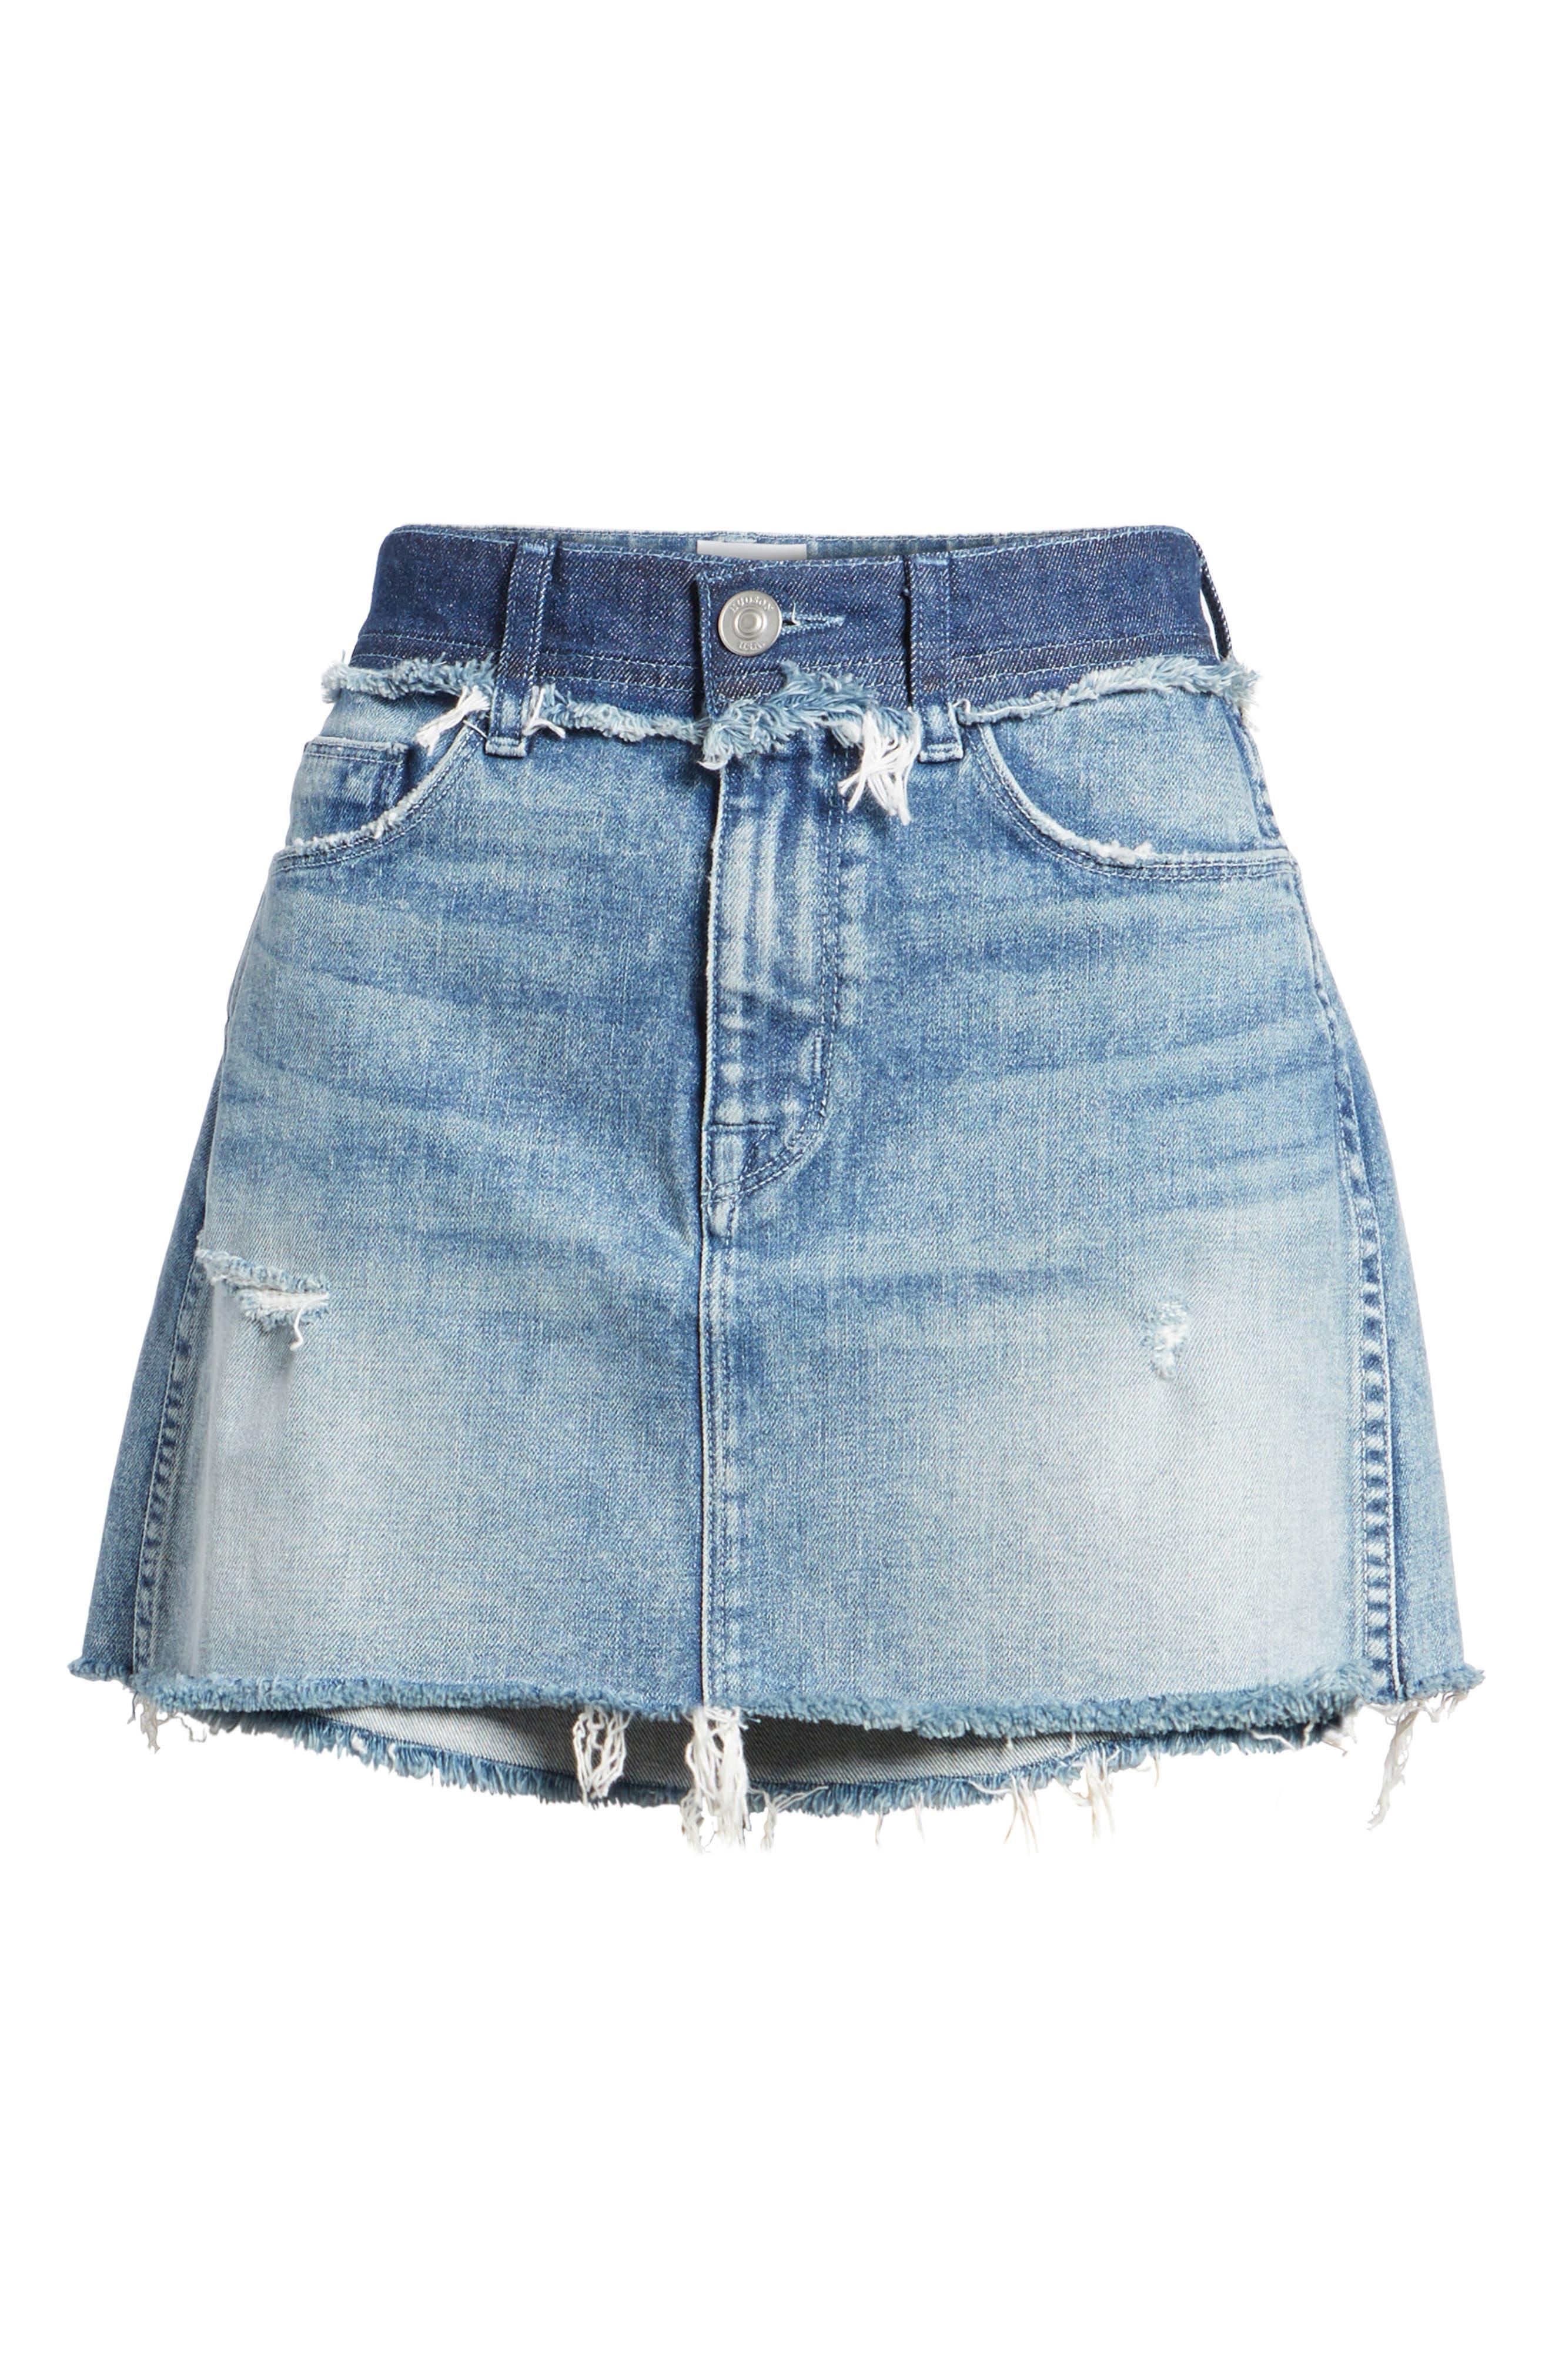 Vivid Cutoff Denim Miniskirt,                             Alternate thumbnail 6, color,                             Rock Steady